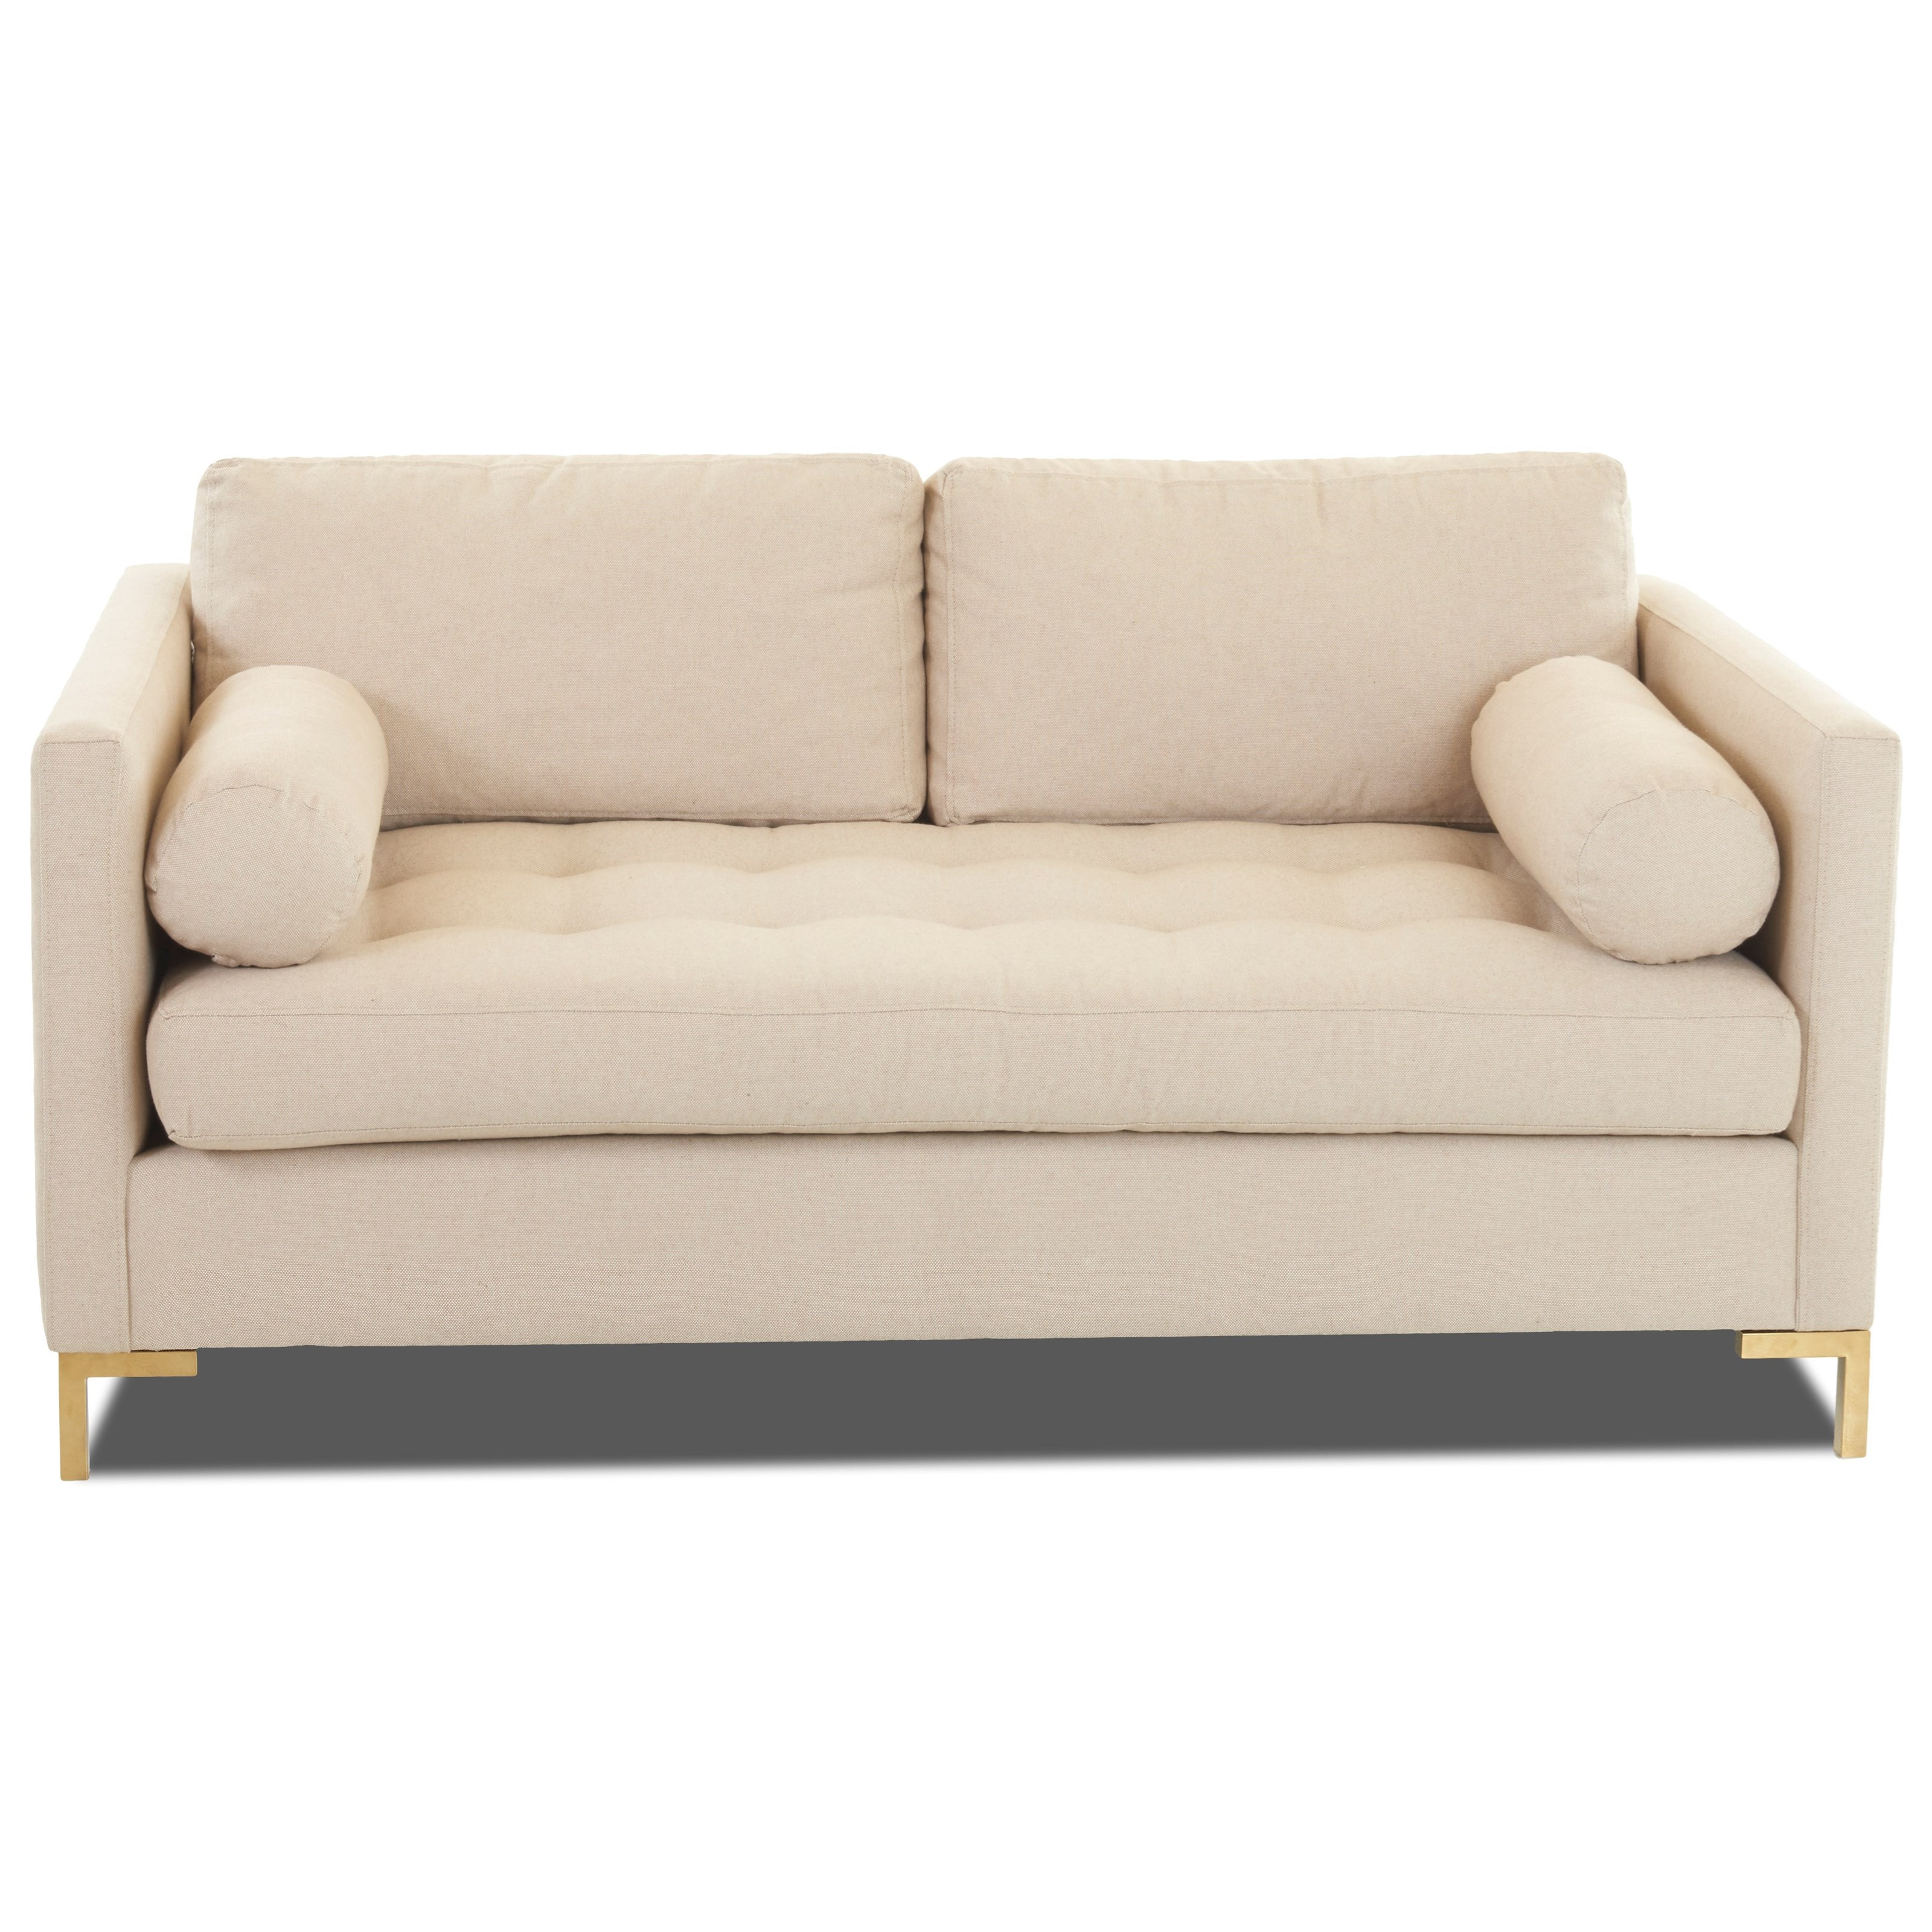 Klaussner Love Seat